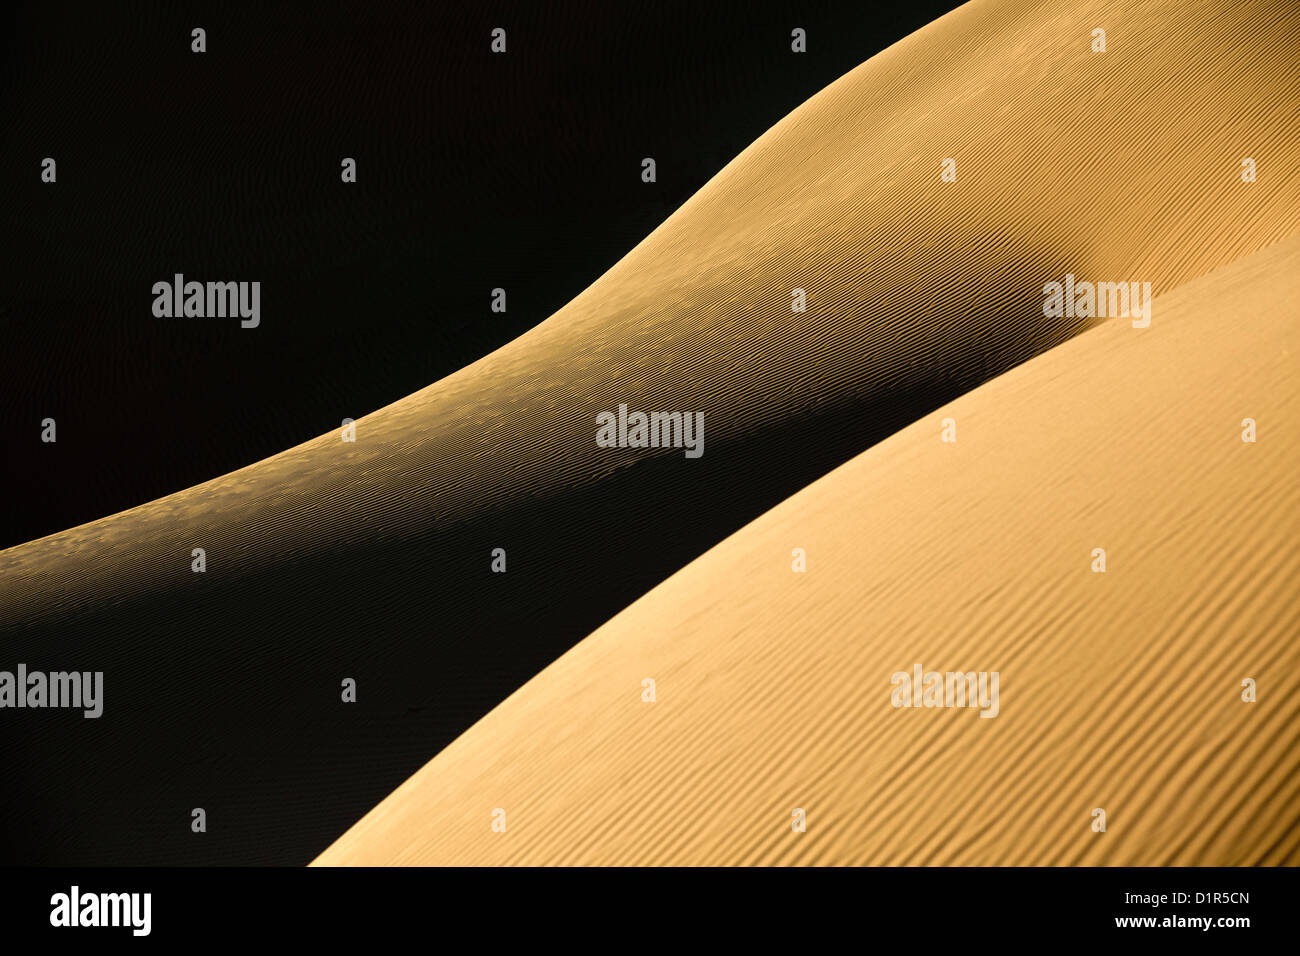 Marokko, M' Hamid, Erg Chigaga Dünen. Wüste Sahara. Rippelmarken Detail. Stockbild